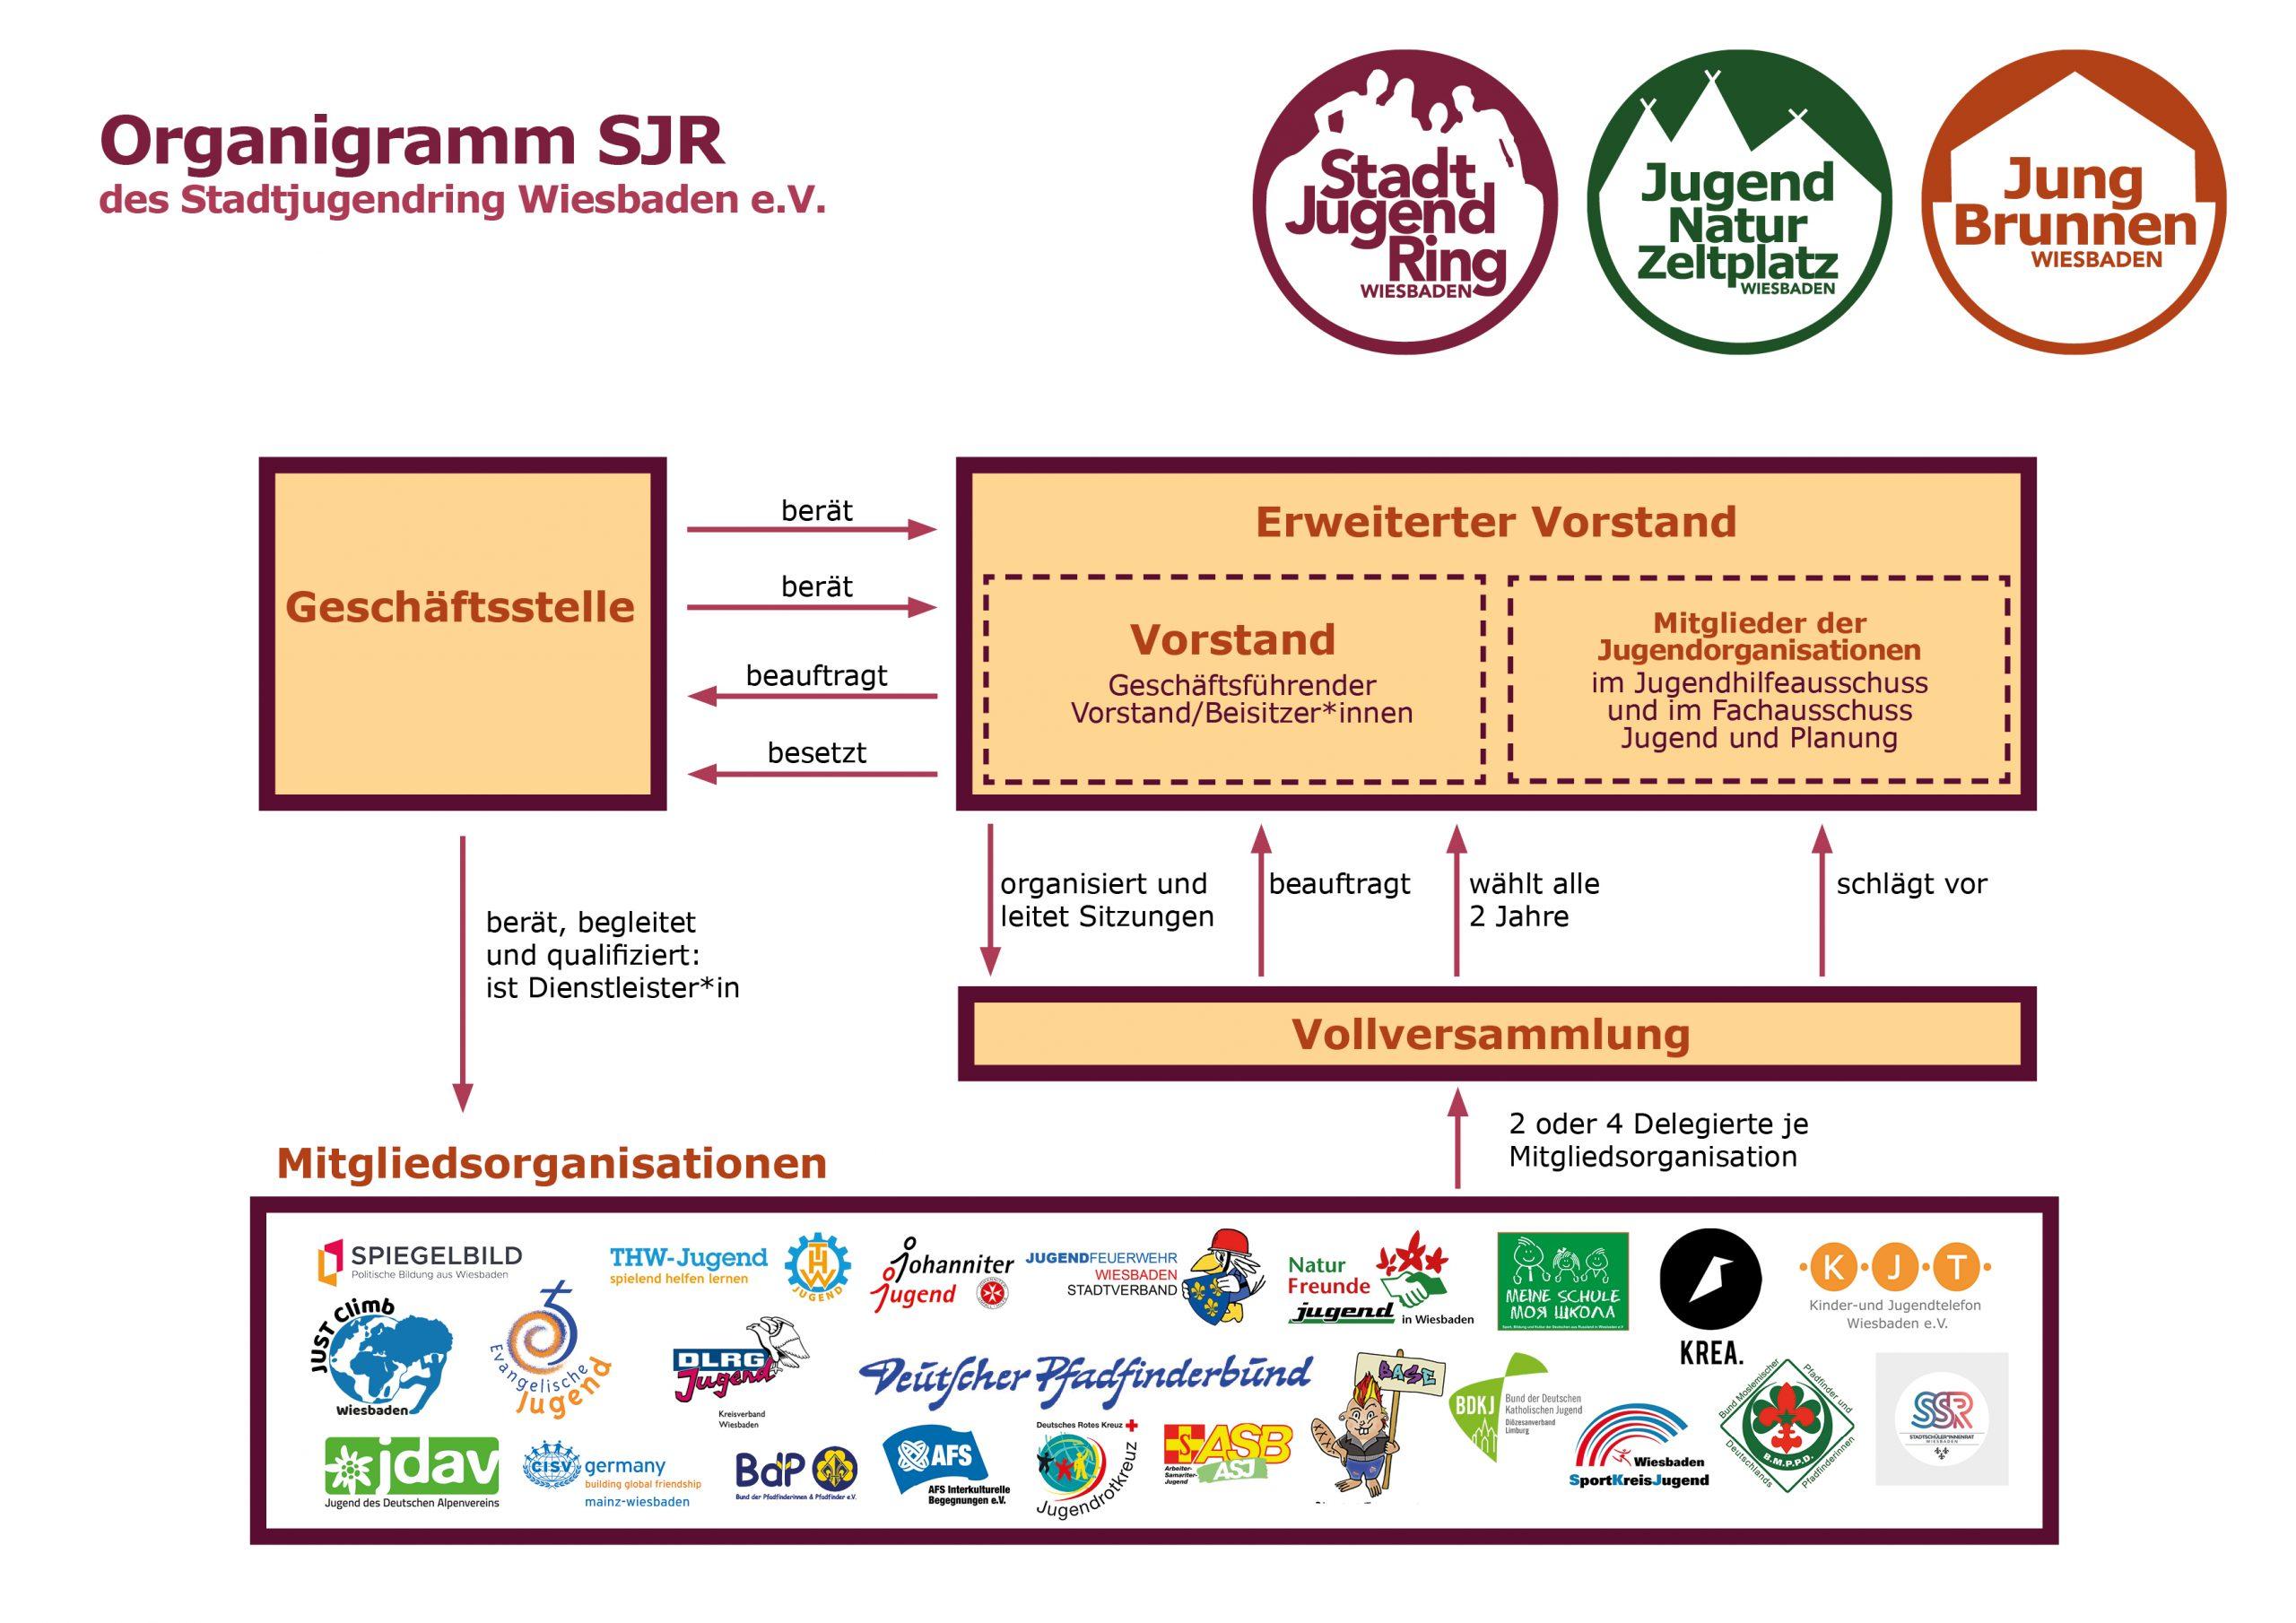 Organisatorische Struktur des Stadtjugendrings